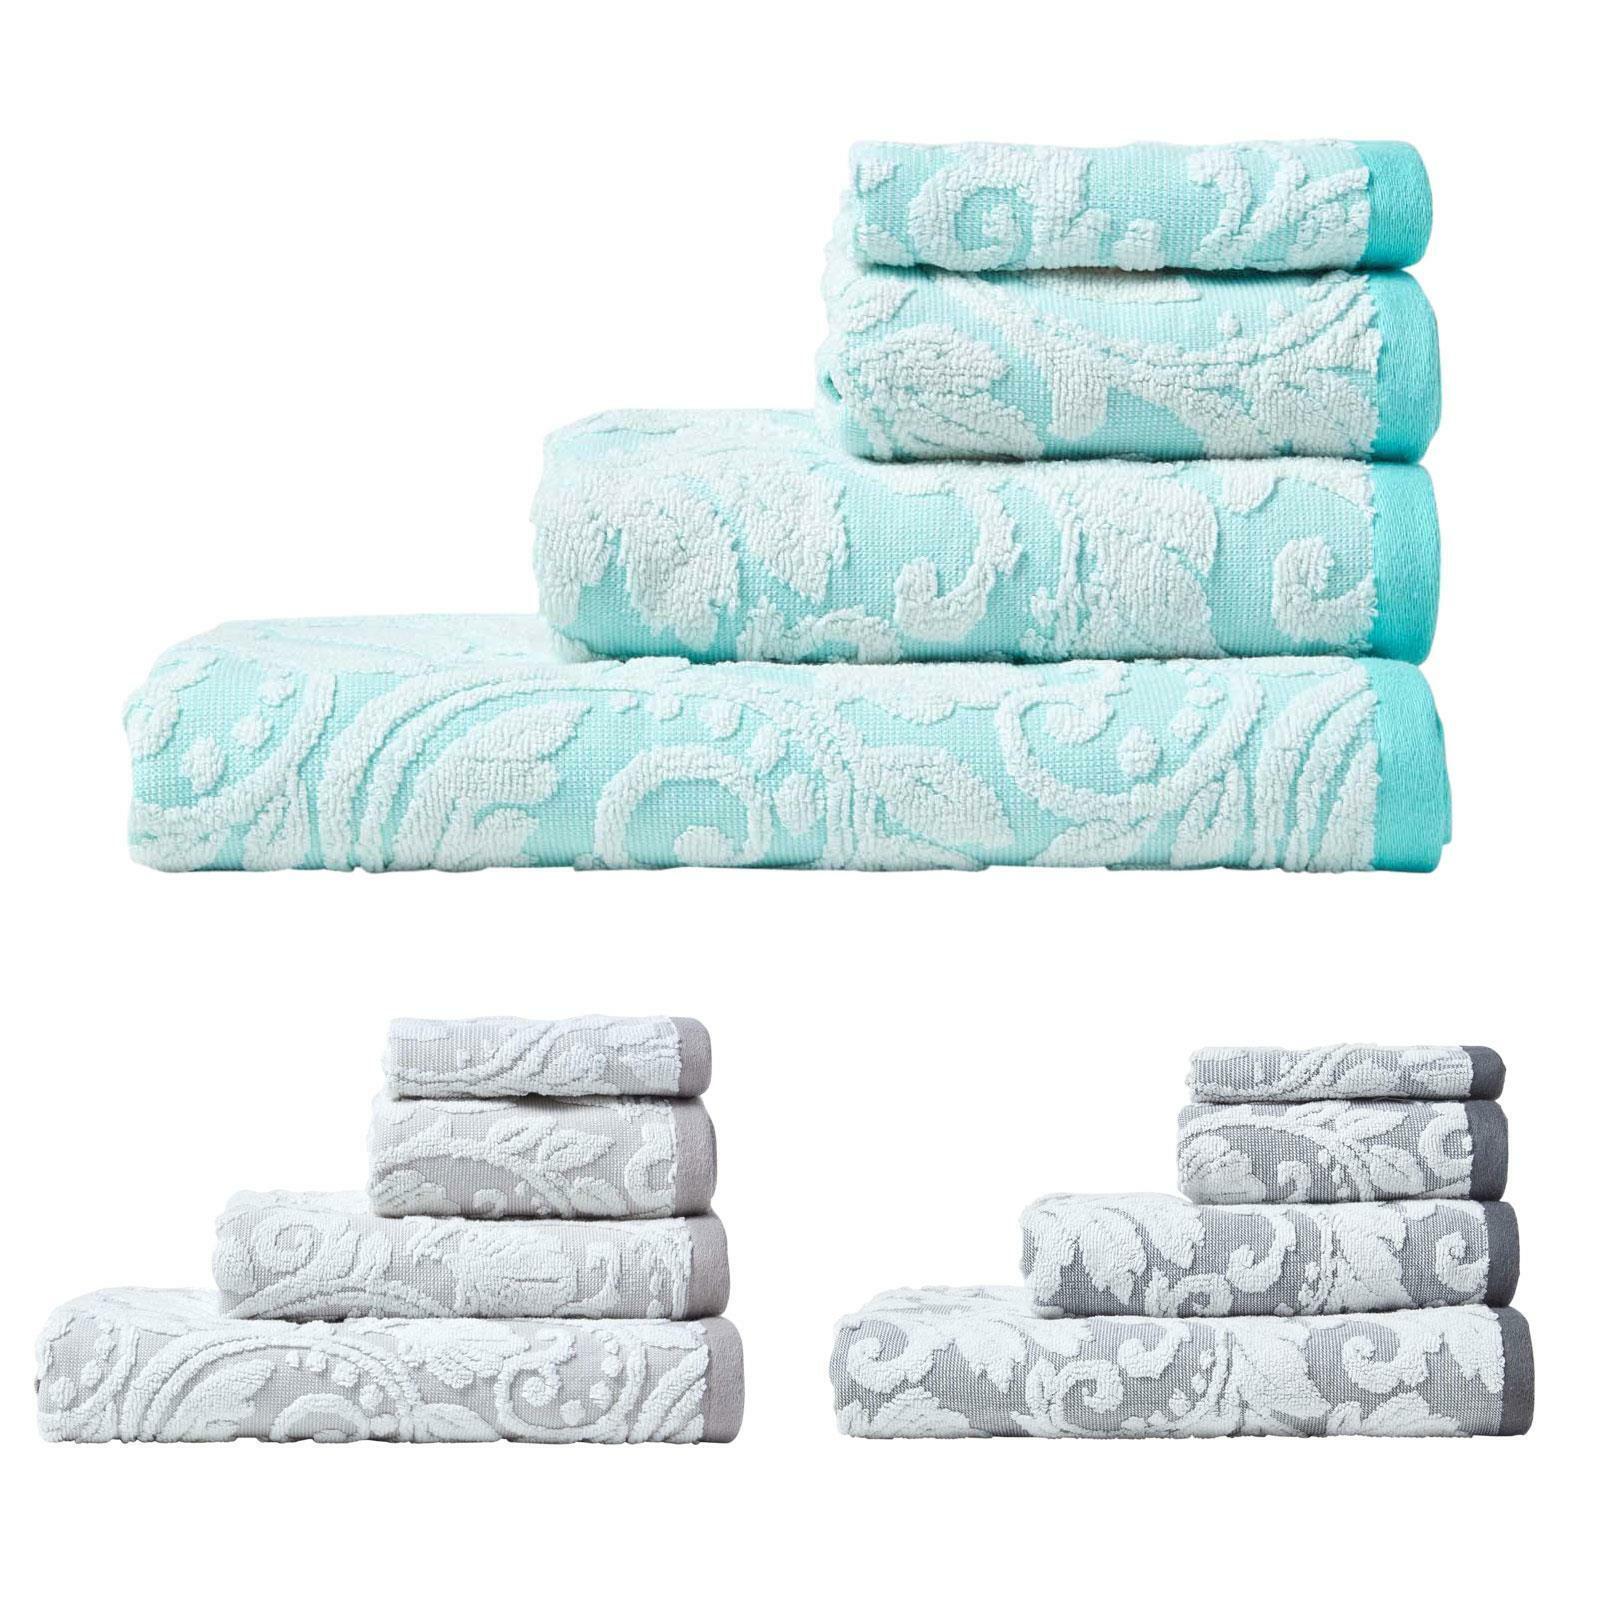 Turkish Cotton Damask Pattern Super Soft Fluffy & Absorbent Towel 600 GSM